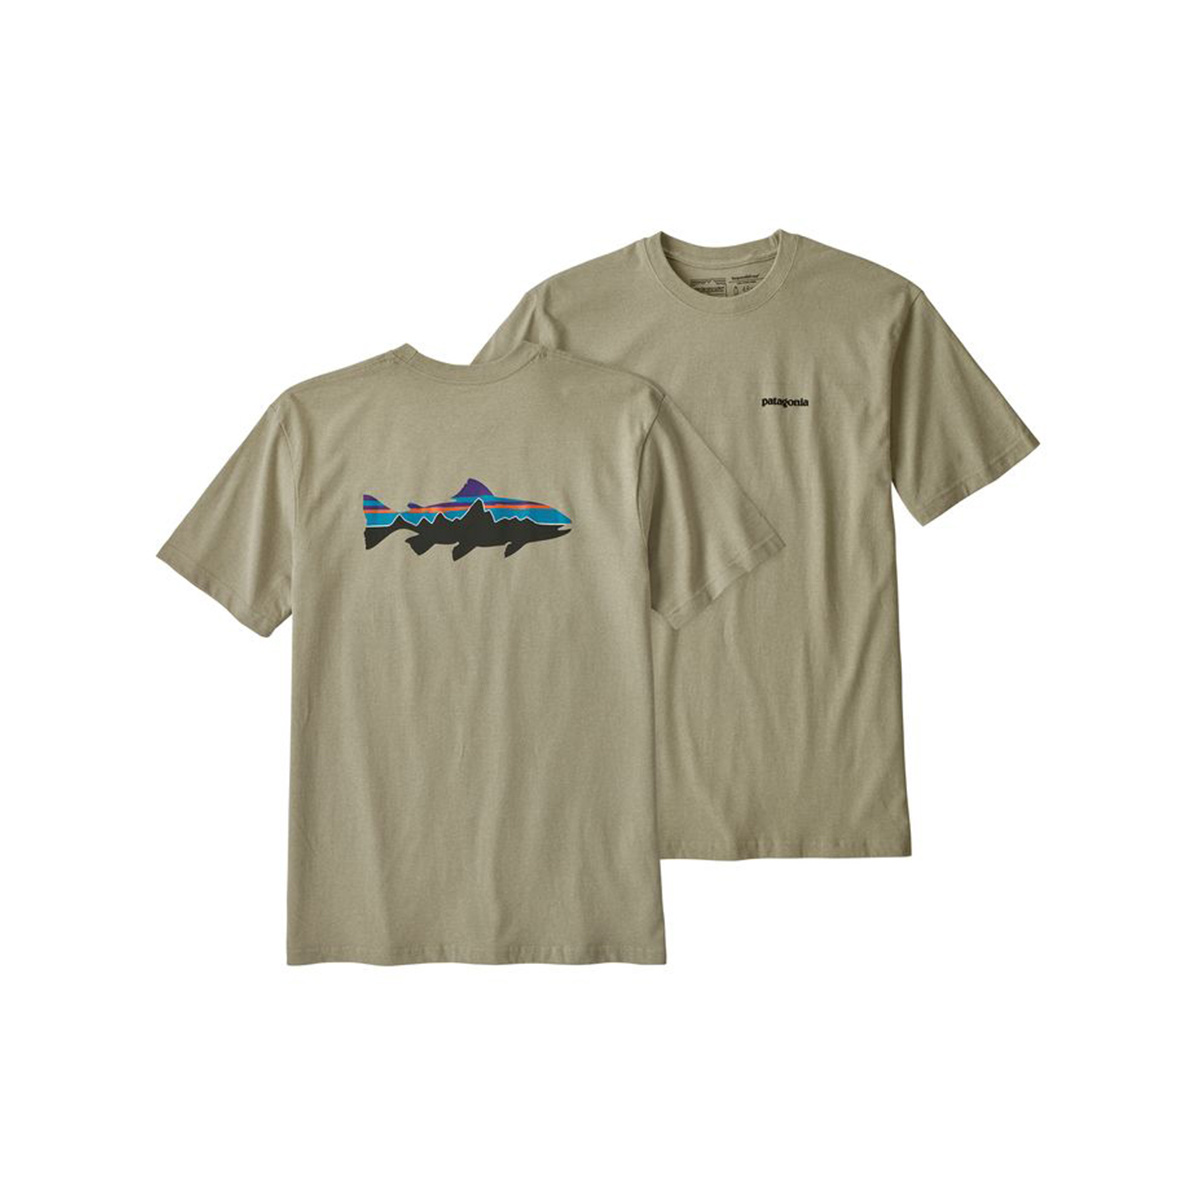 Patagonia Men's Short Sleeve Fitz Roy Trout Responsibili-Tee